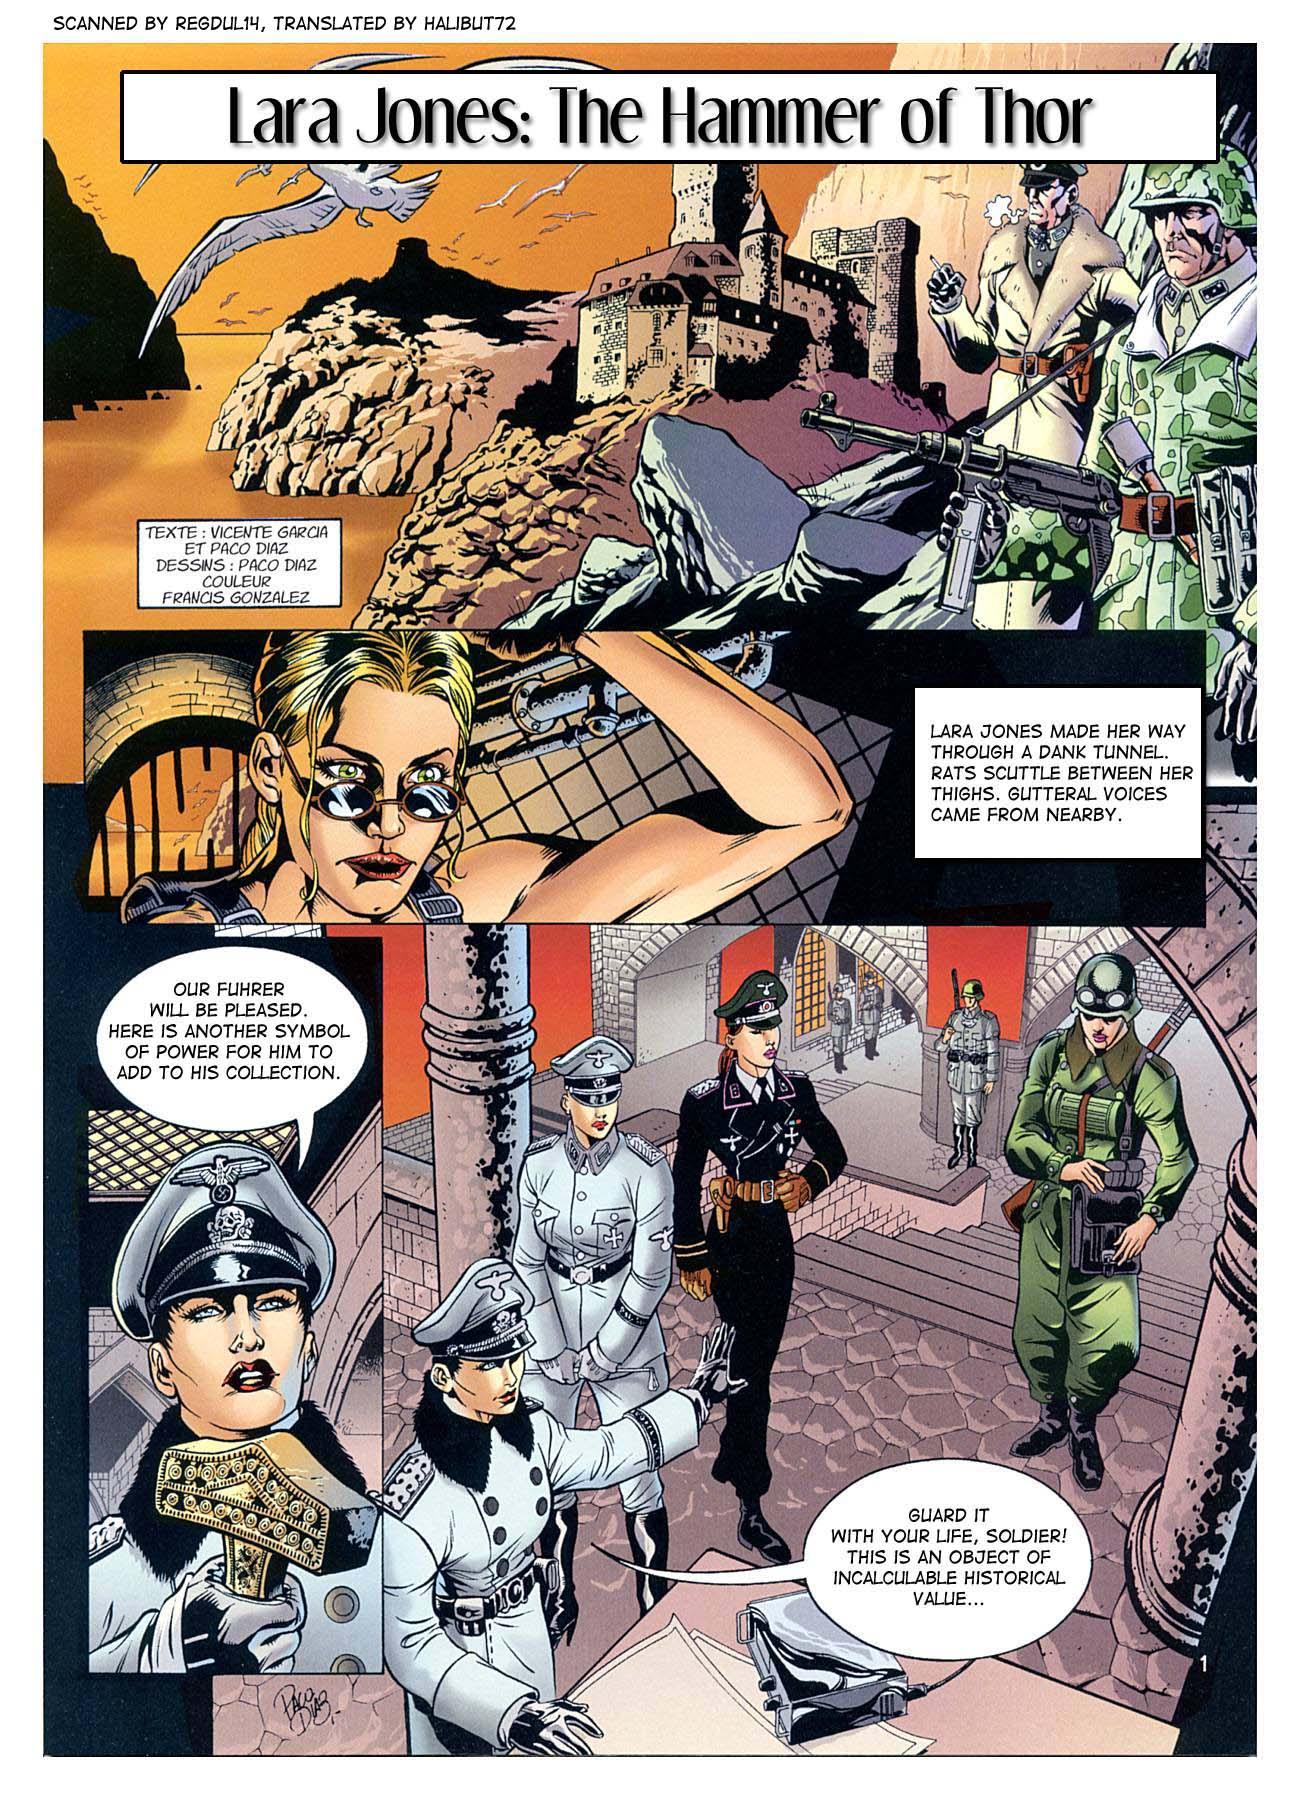 The Hammer Of Thor- Lara Jones porn comics 8 muses